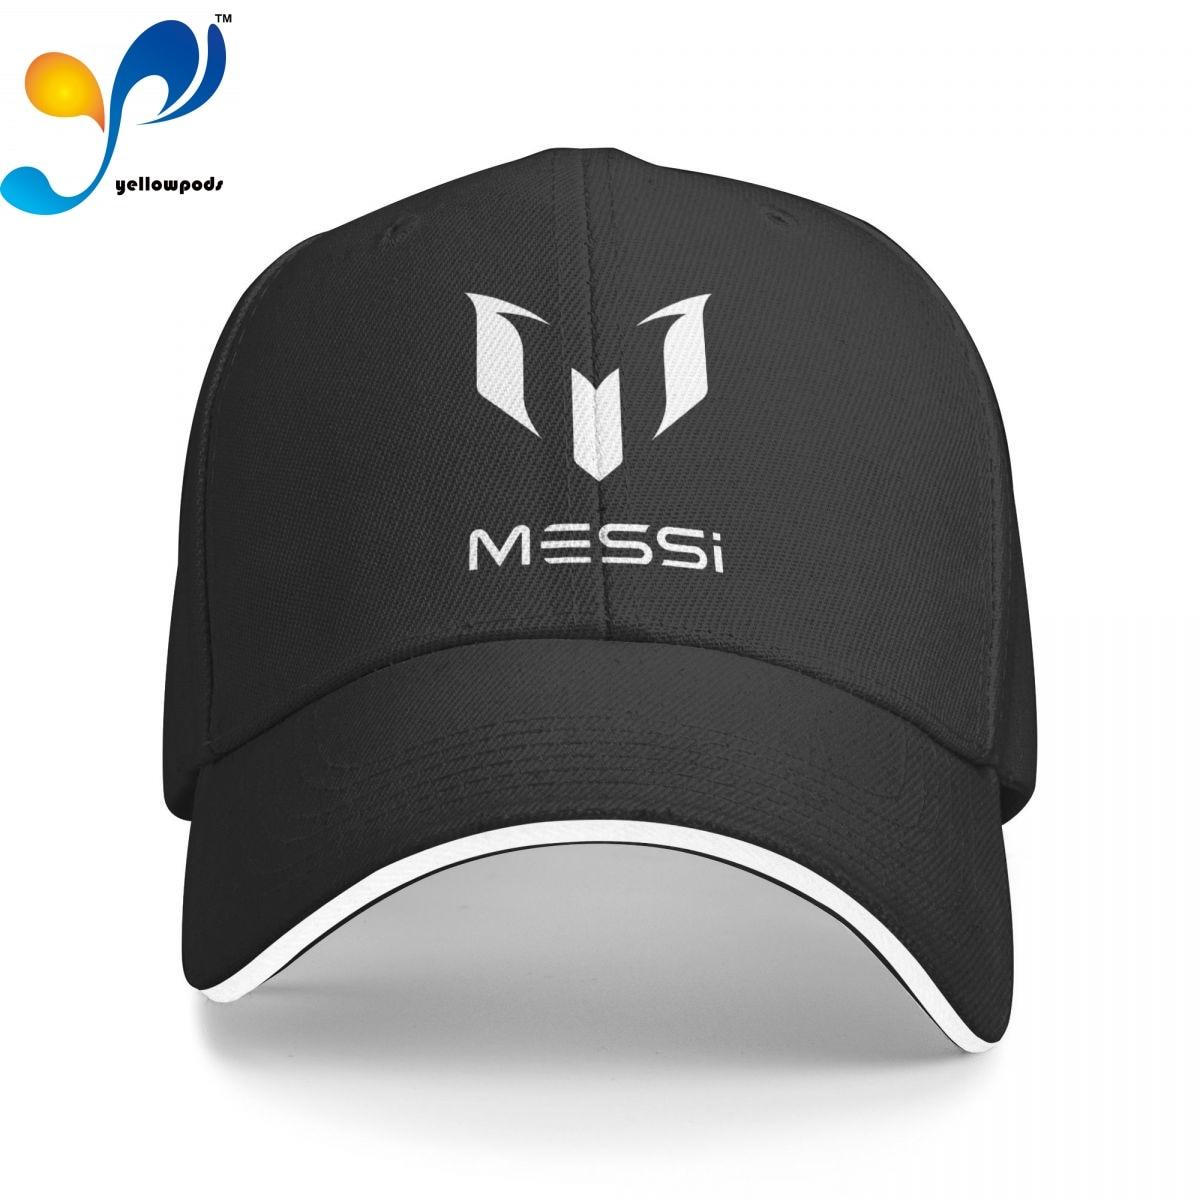 Футболка с Месси, Кепка-бейсболка для мужчин, бейсболка с клапаном, мужские шапки, кепки с логотипом